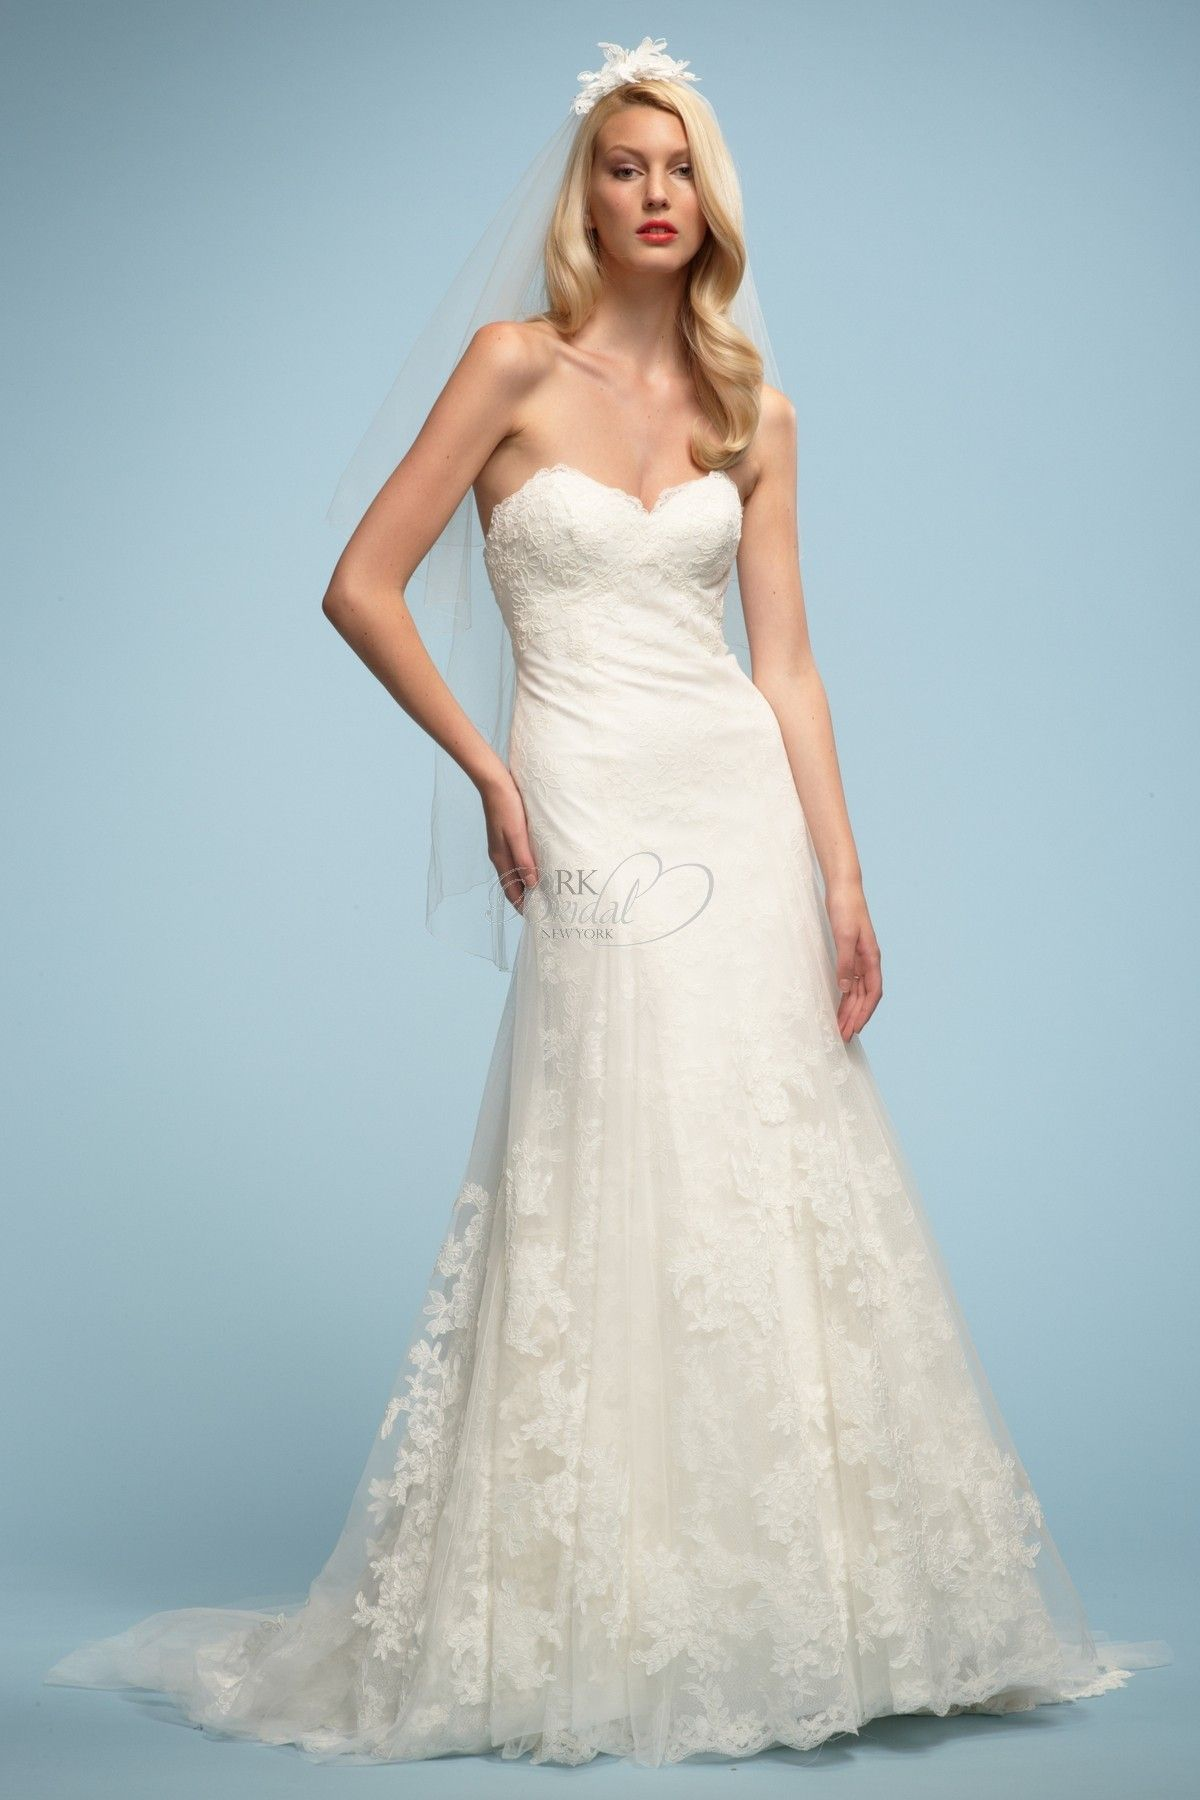 Watters & Watters Bridal Spring 2013 - Style 3045 Gloria | b&t ...